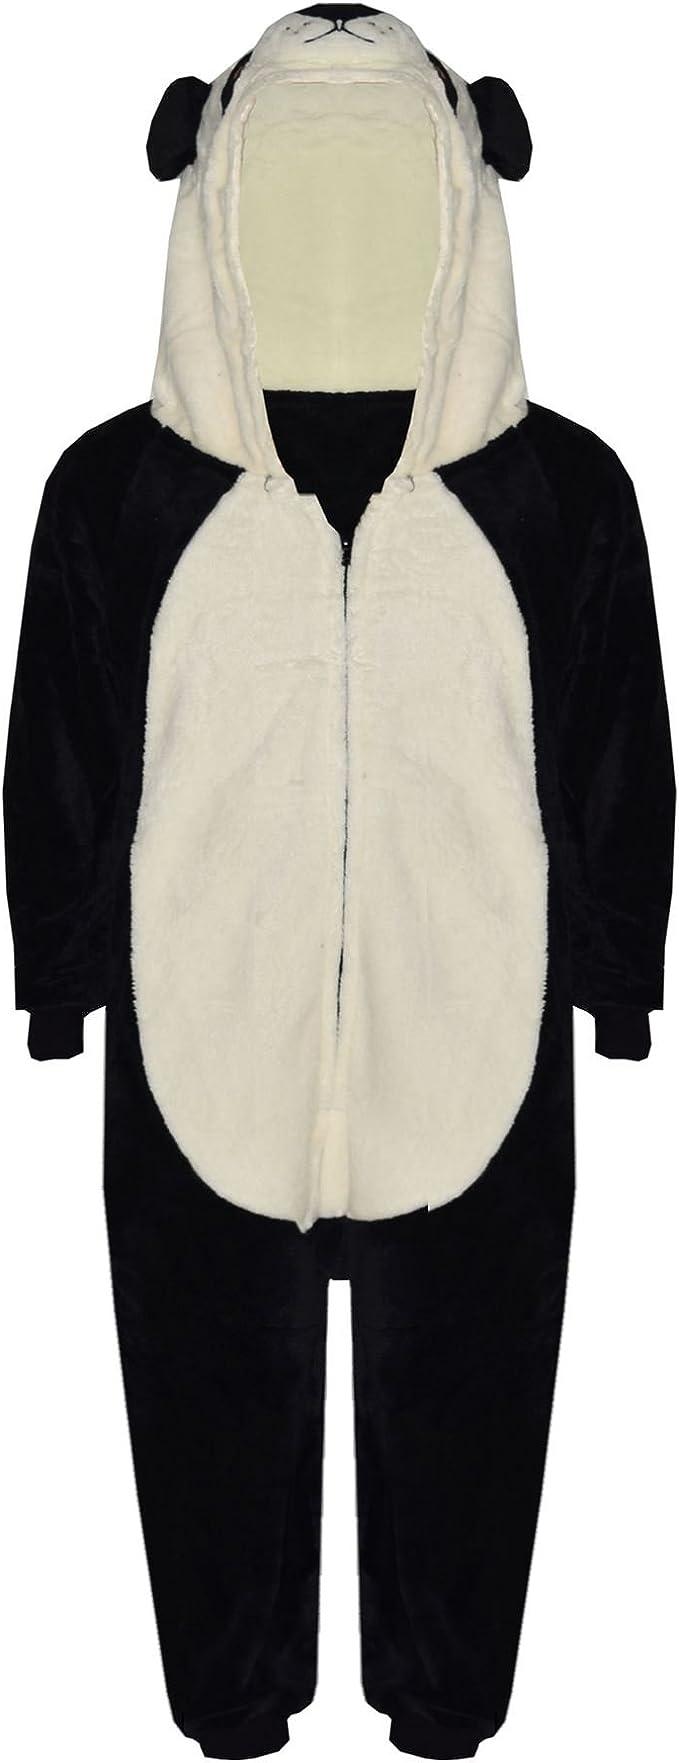 Kids Girls Boys A2Z Onesie One Piece Soft Fluffy Cow Halloween Costume 7-13 Year